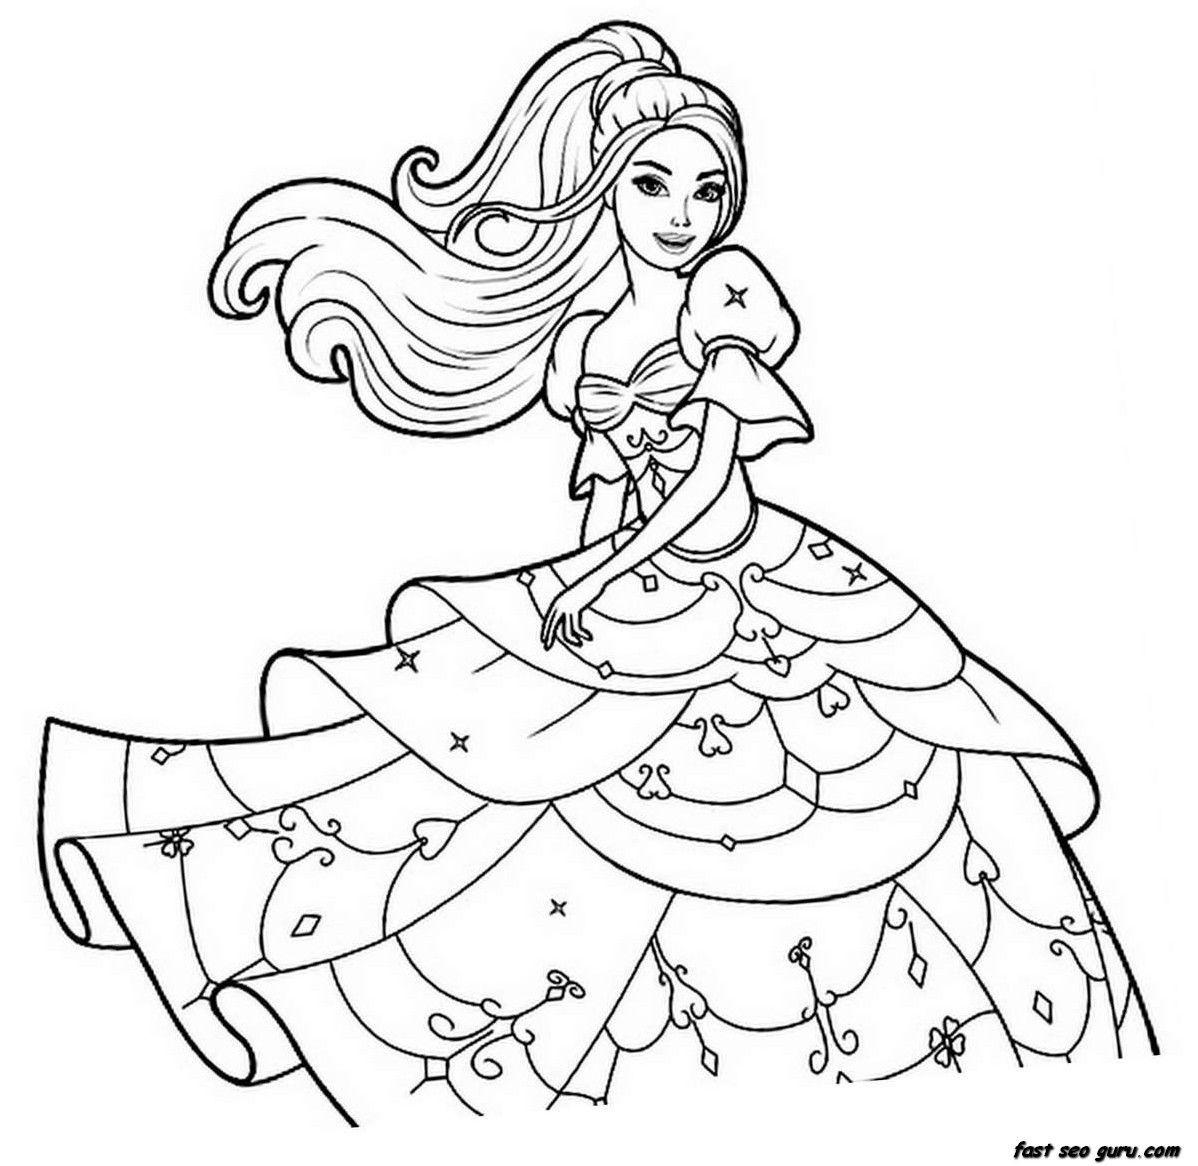 Barbie Ausmalbilder Kostenlos Zum Drucken : Color Sheets To Print Out Barbie Print Out Coloring Pages Cancun